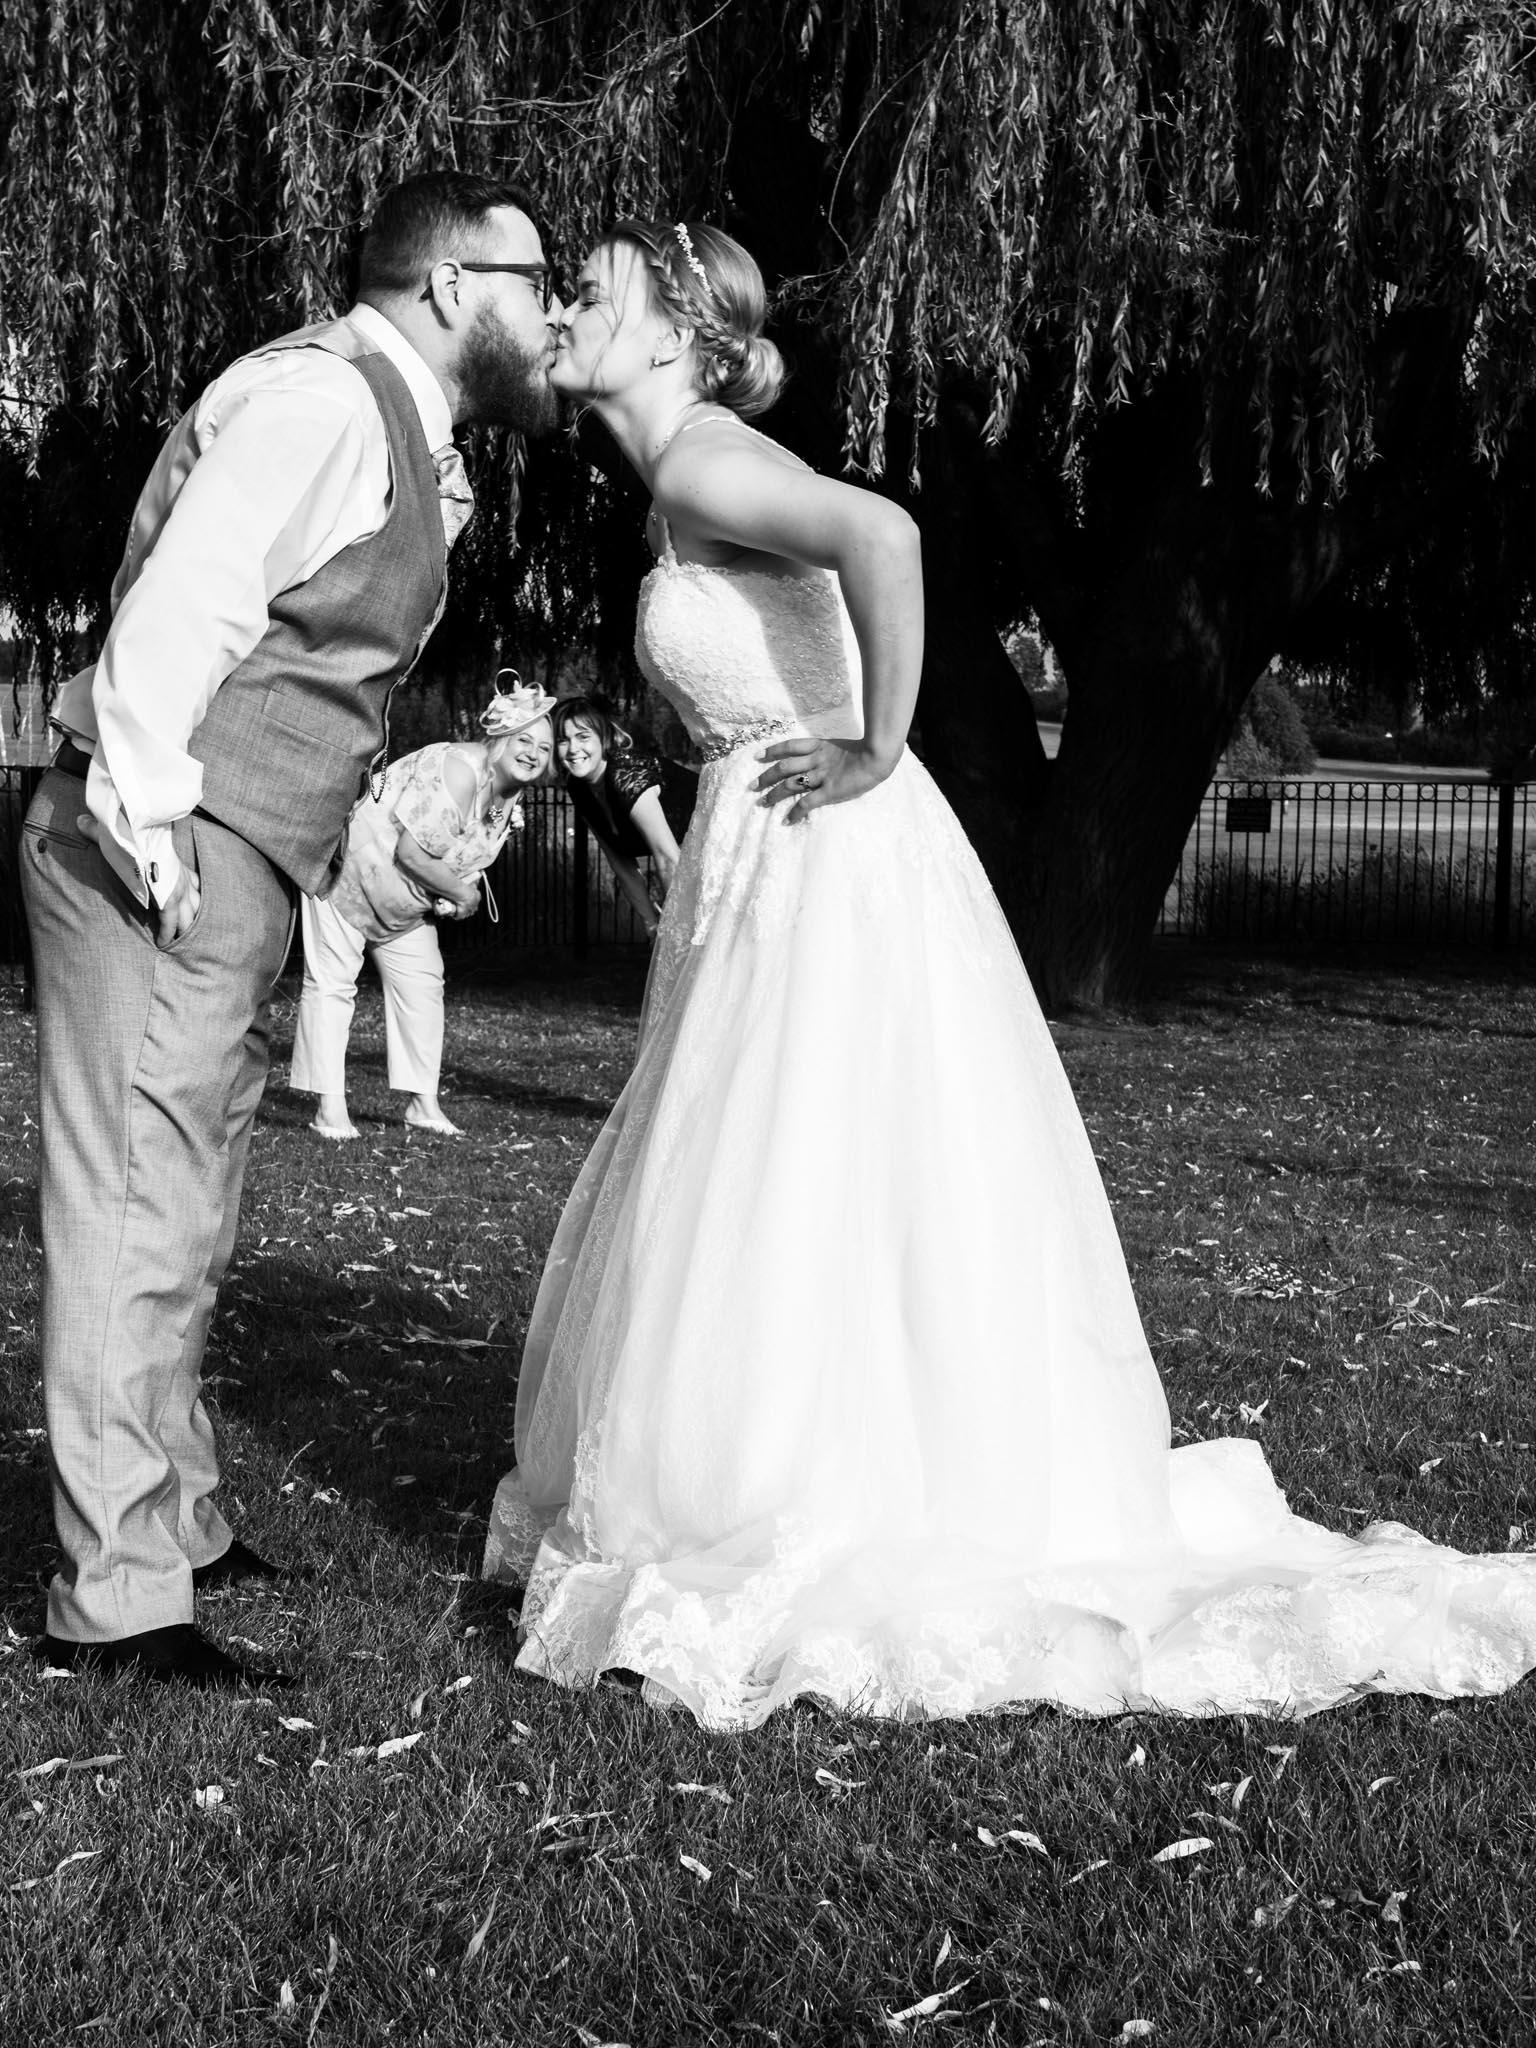 688-family-friends-Luke-Yasmin-The-Rayleigh-Club-Wedding-Photography.jpg